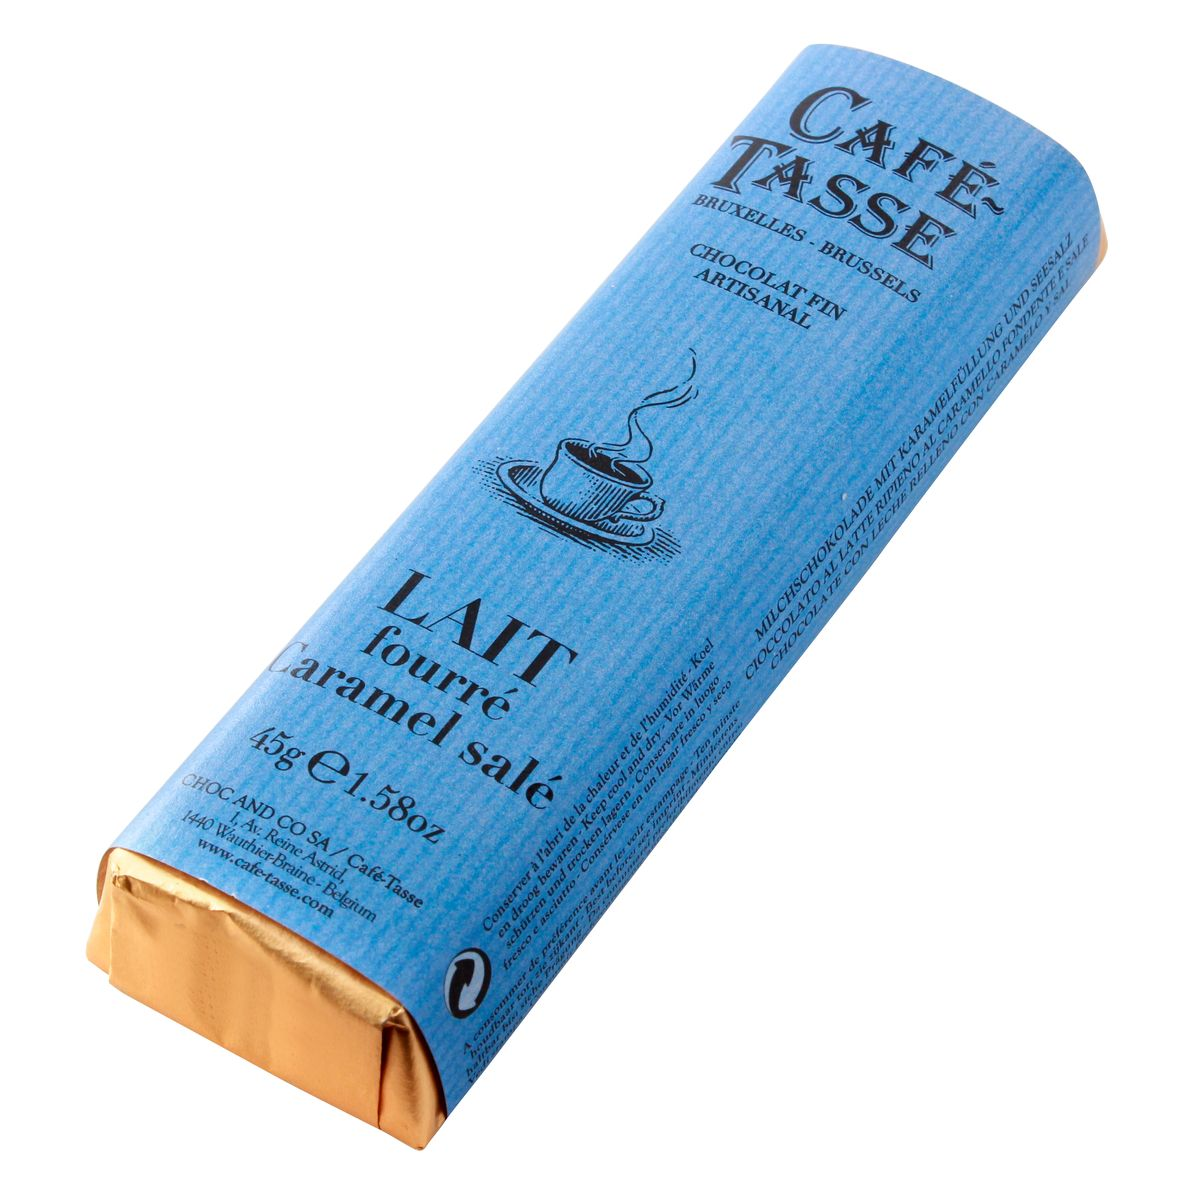 Bâton assorti goût lait caramel salé - Cafetasse